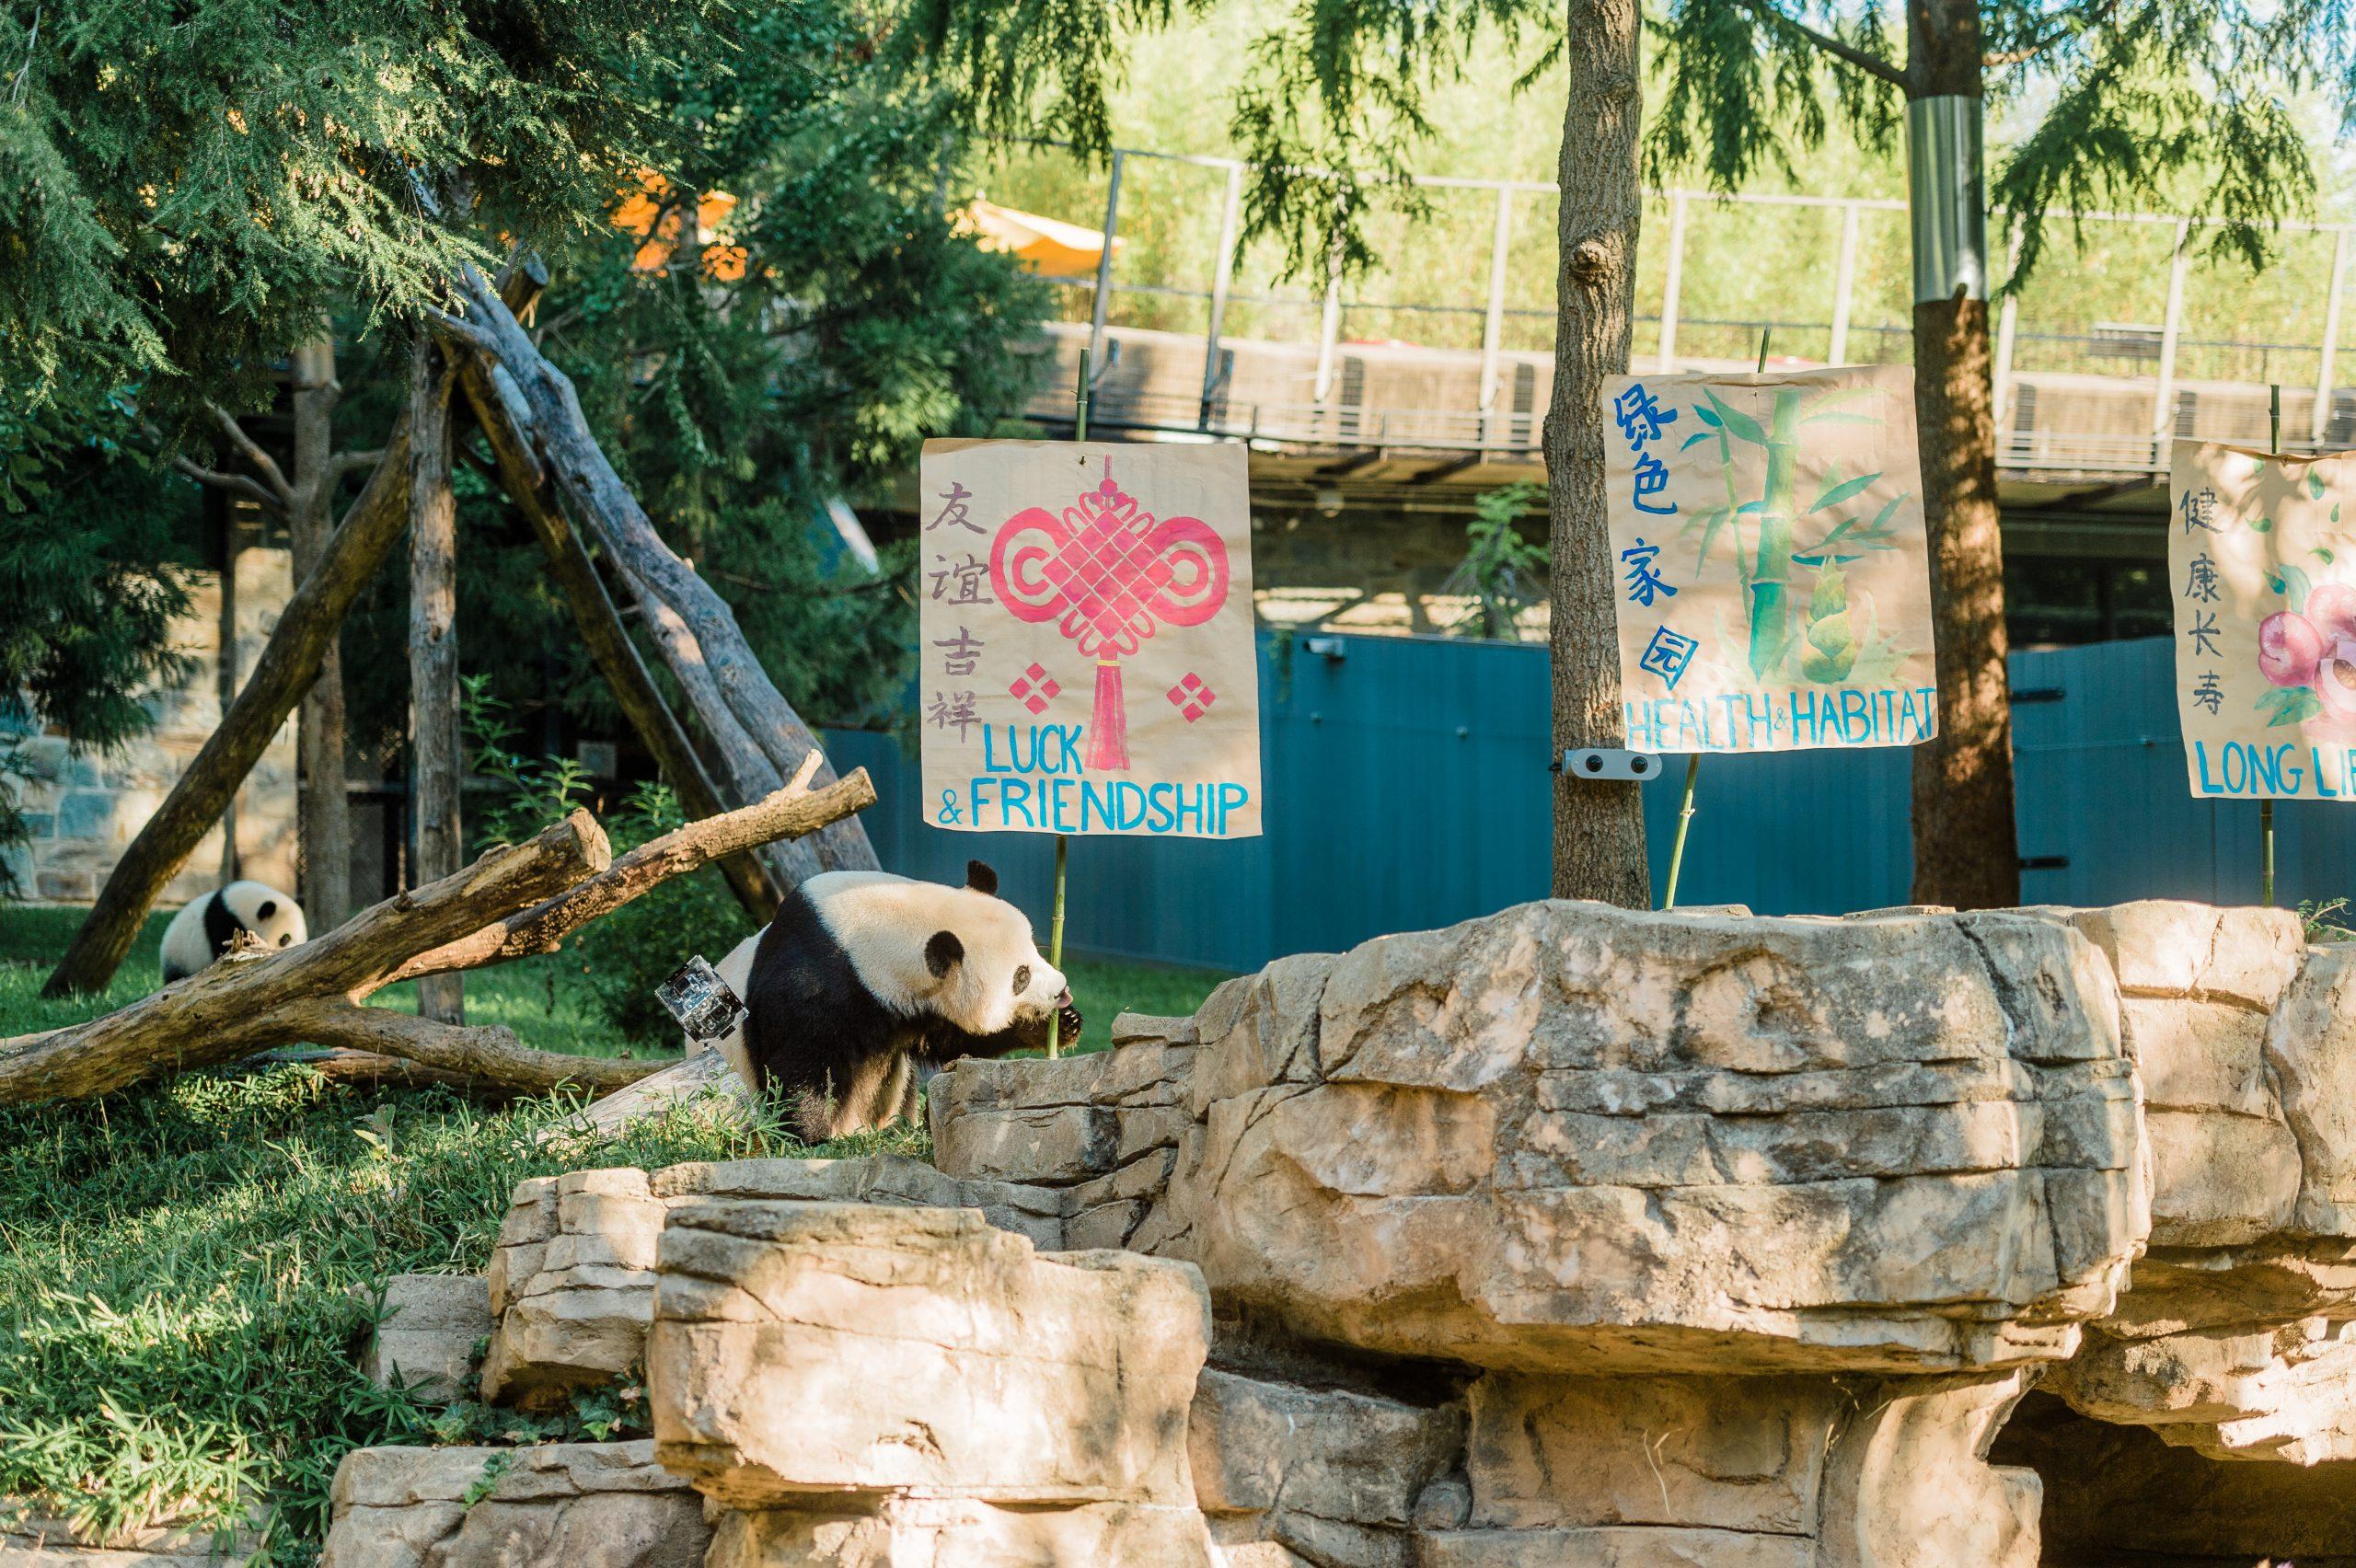 Pandemics and Pandas: China's Global Image in 2021